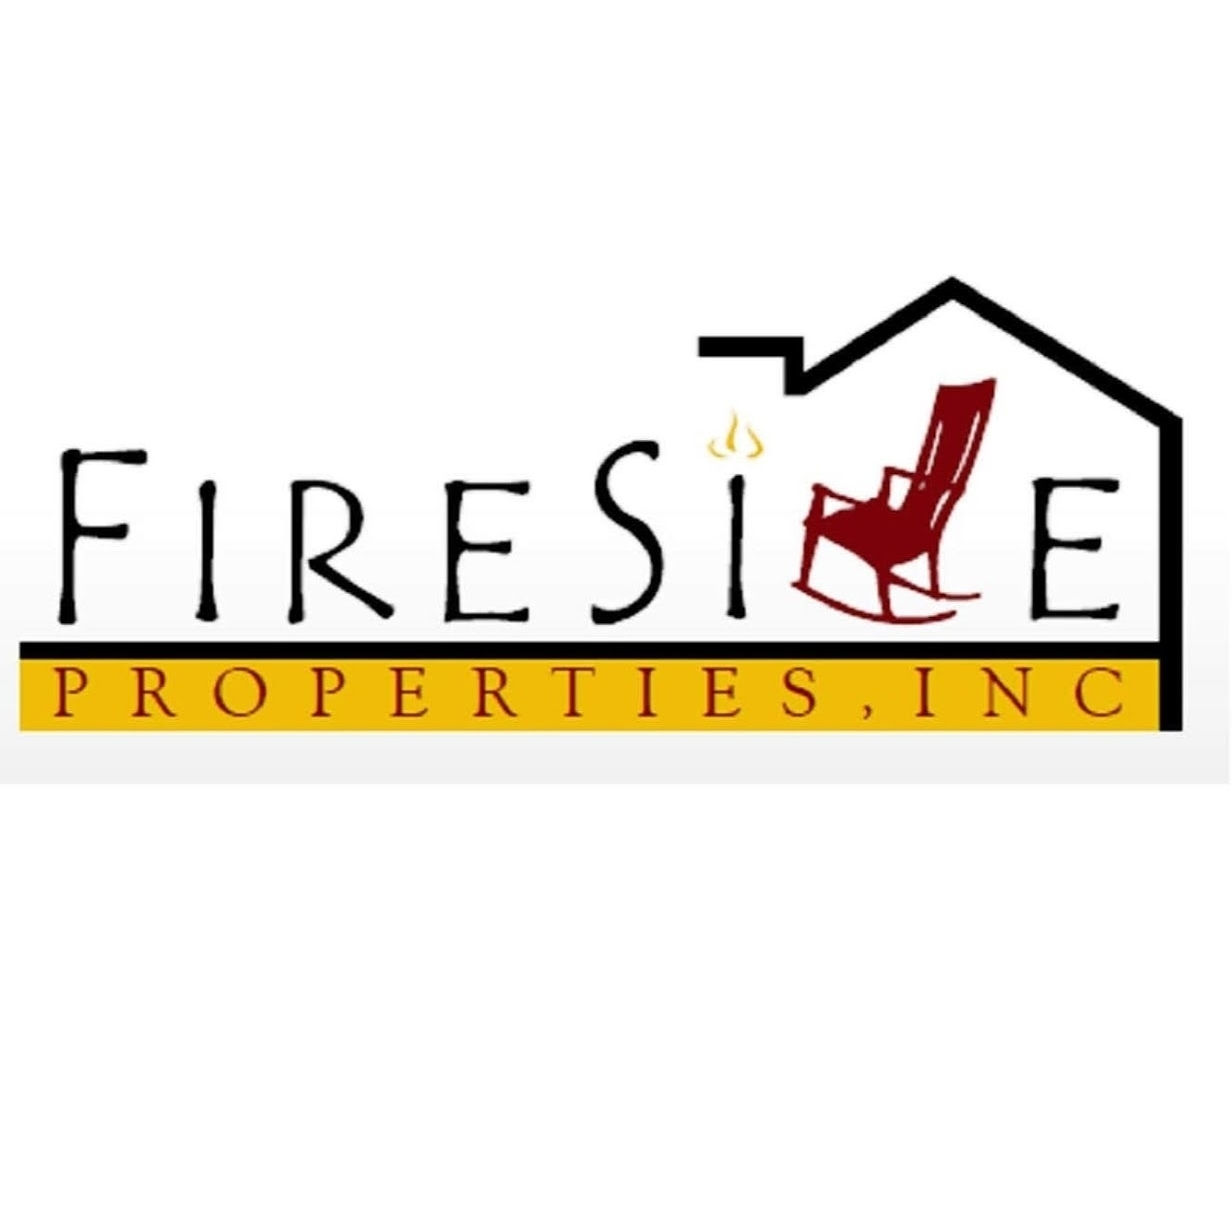 Fireside Properties, Inc.